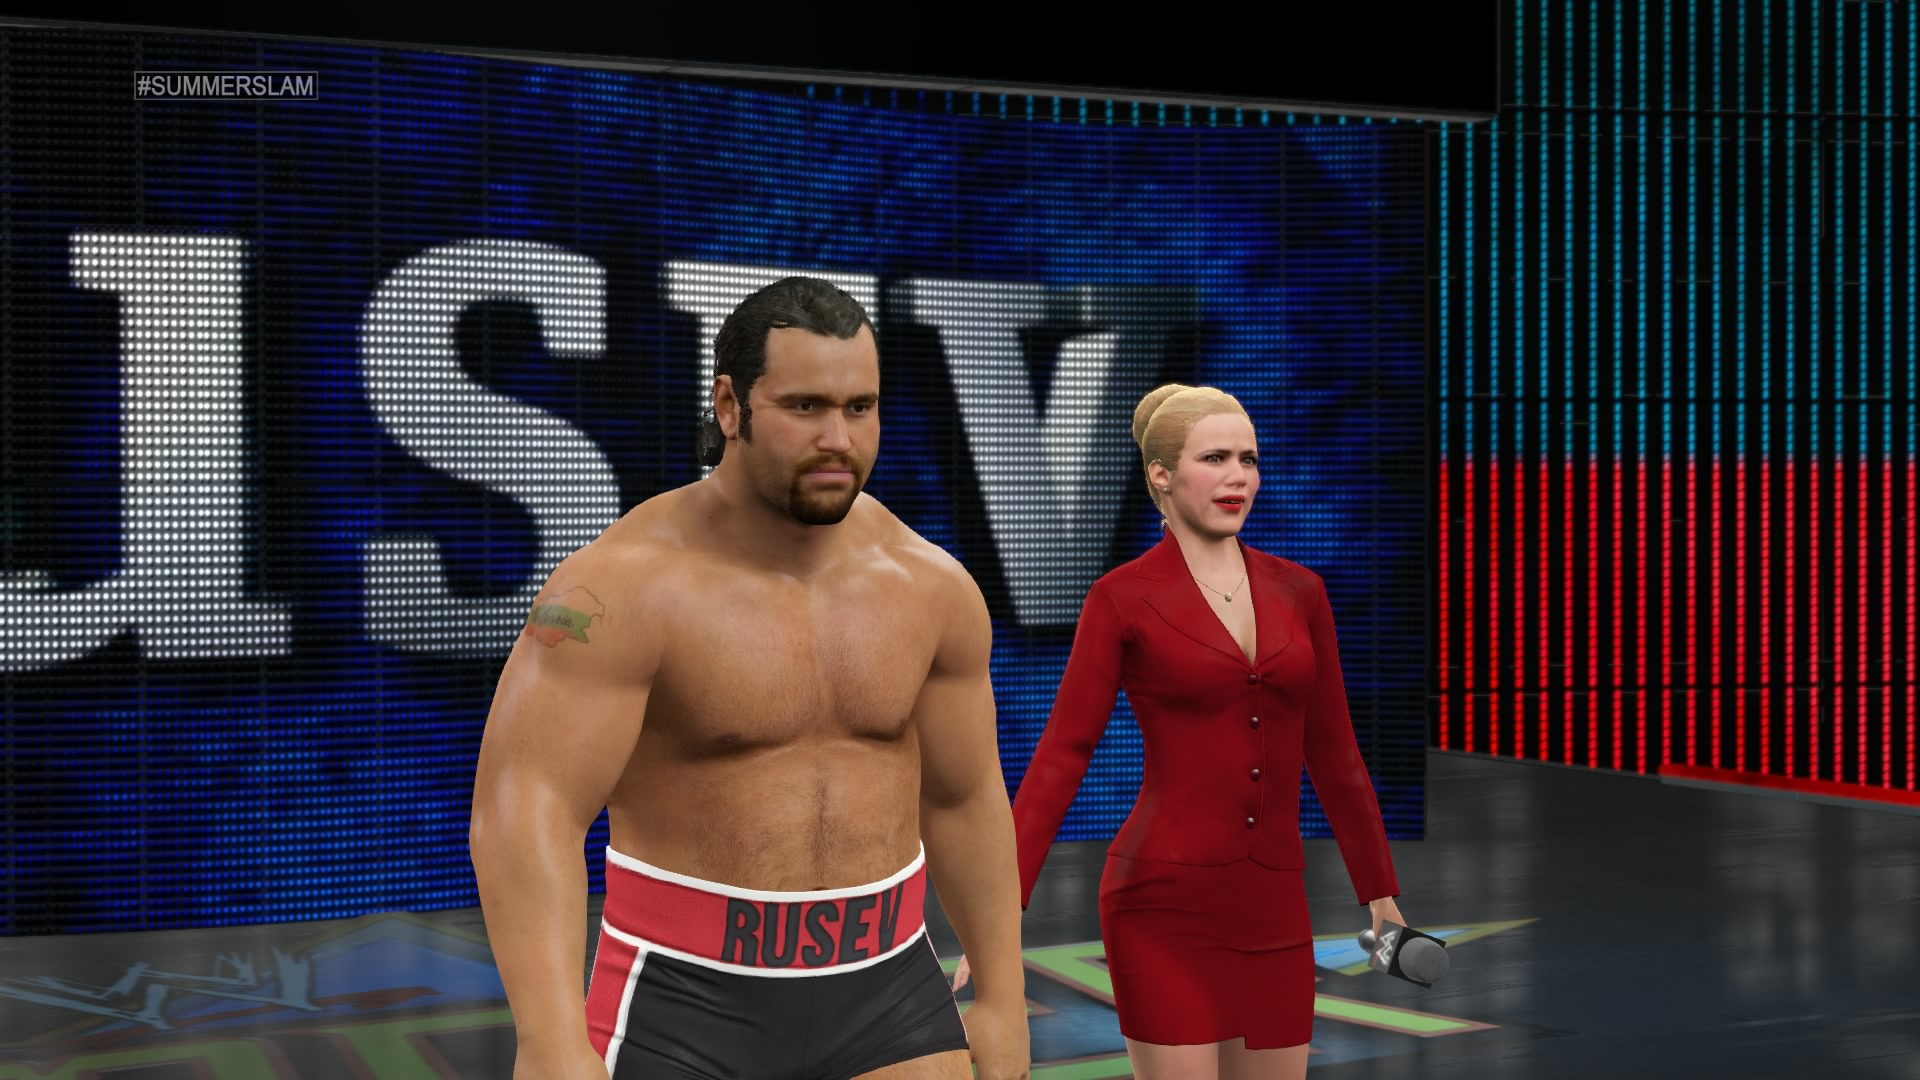 WWE 2k15 problemi di matchmaking